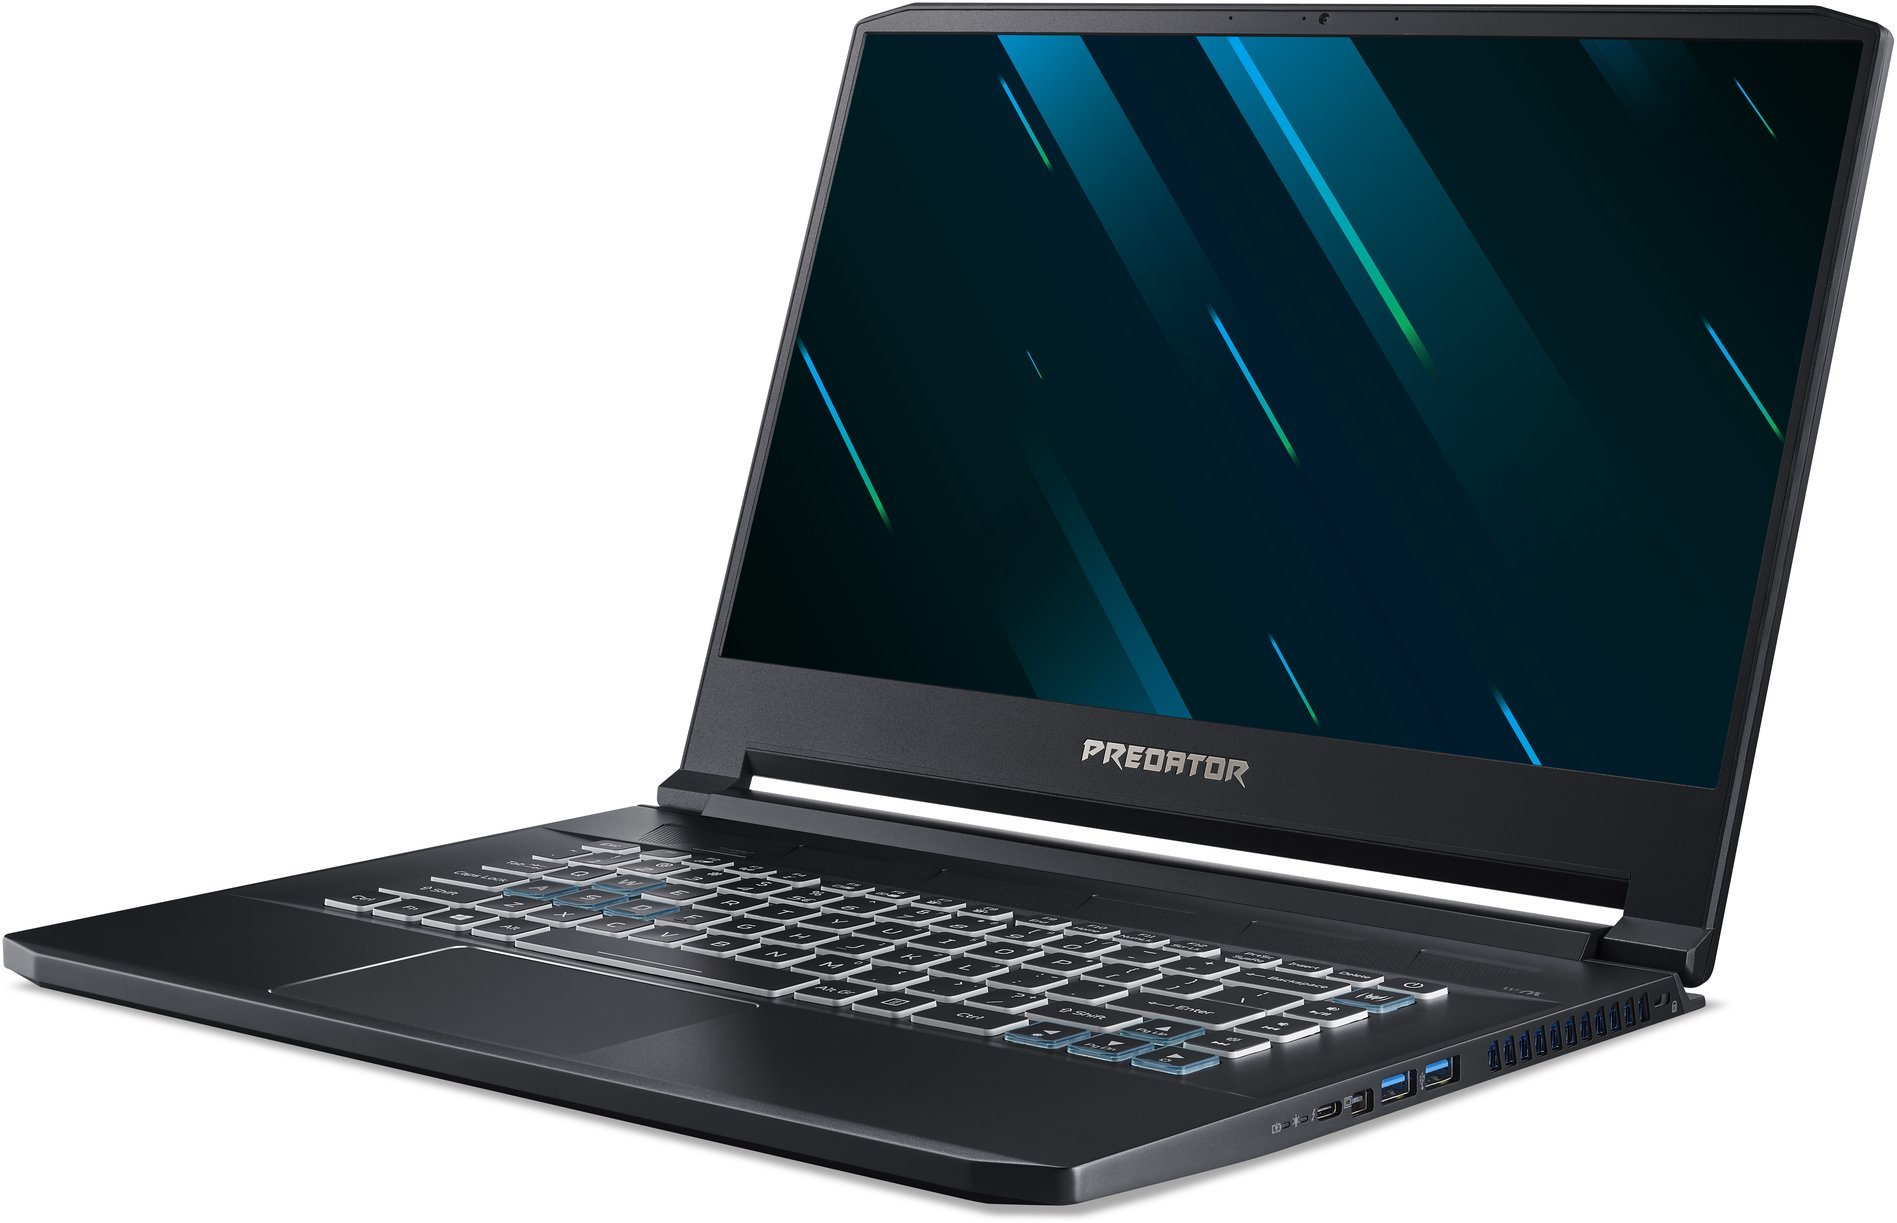 Acer Predator Triton 500 PT515-51-735W